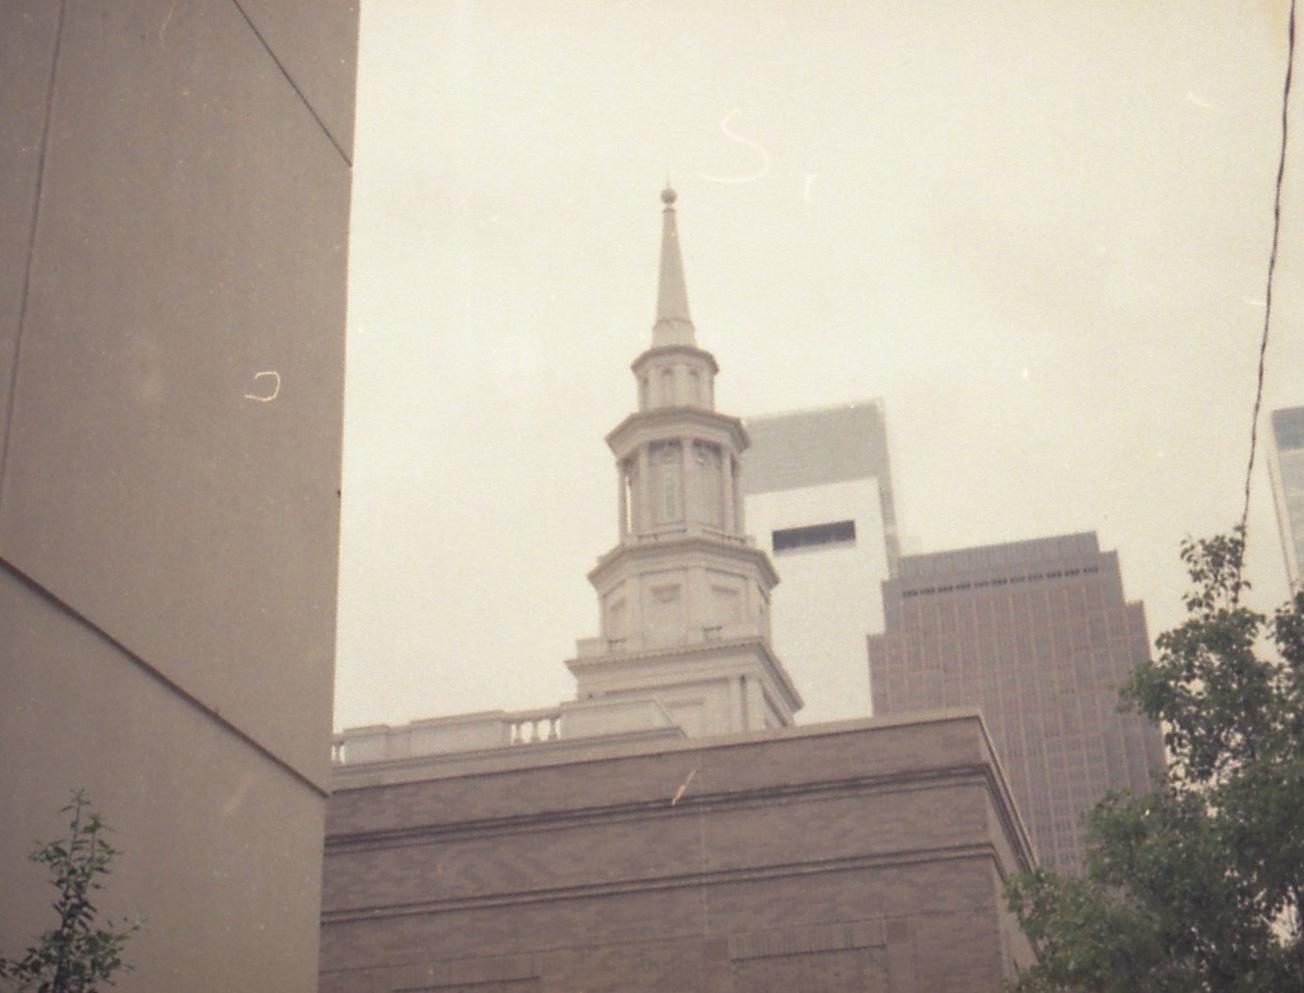 Philadelphia Pennsylvania Temple and Comcast Building